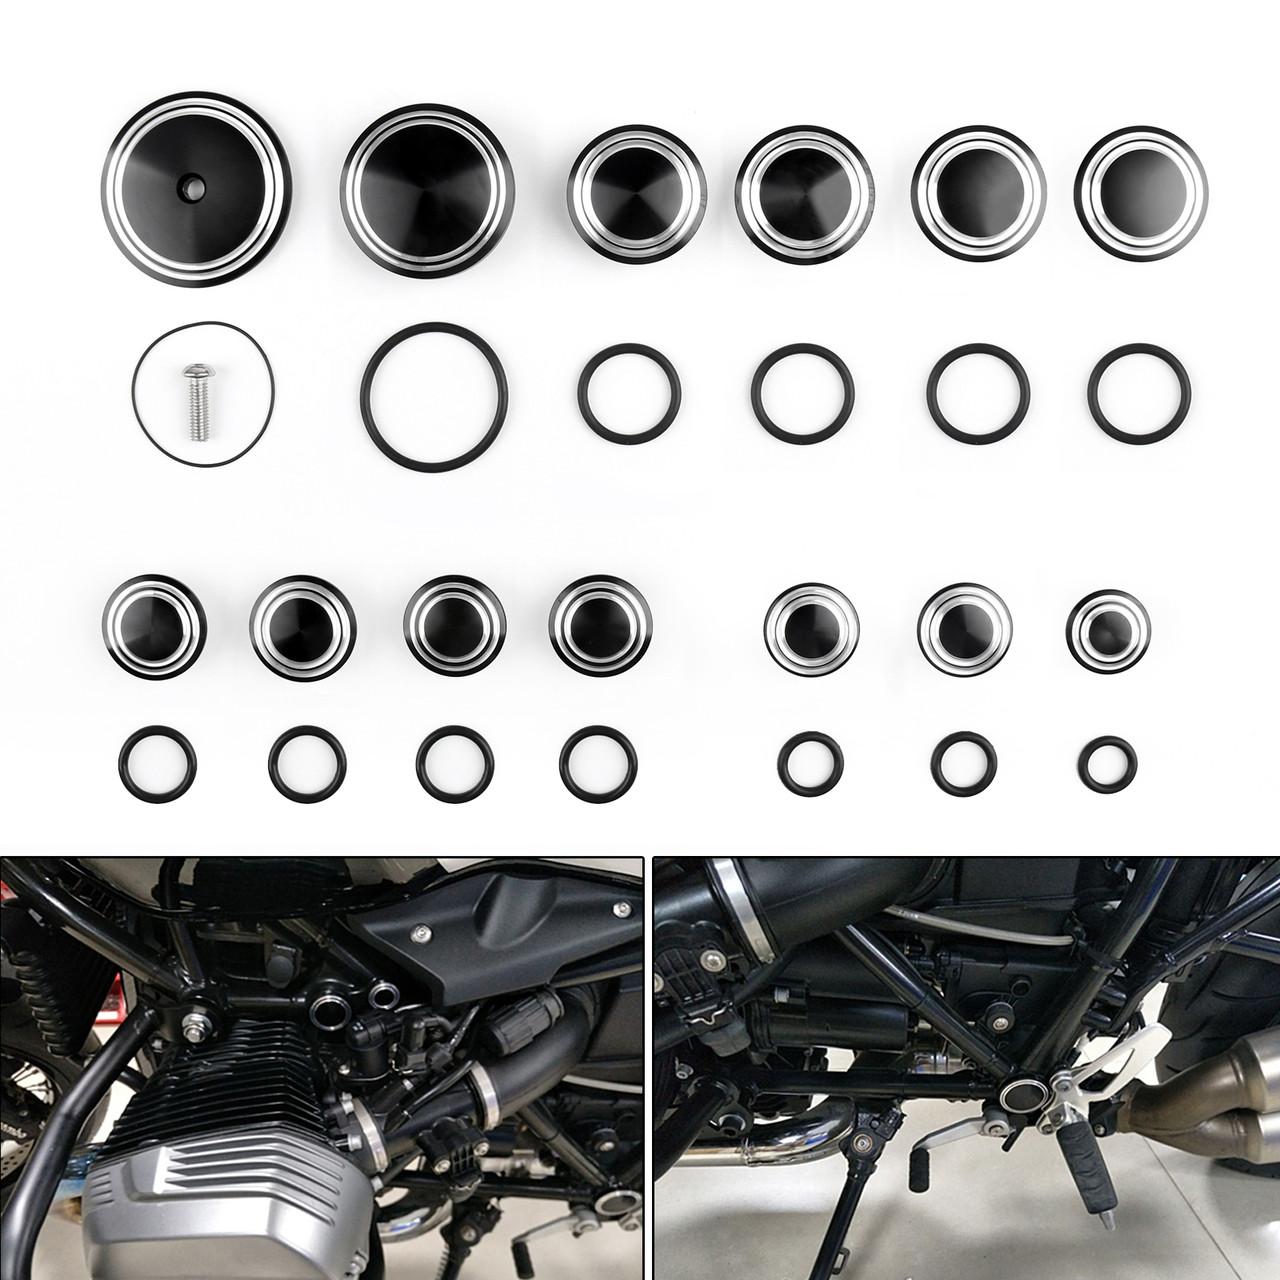 http://www.madhornets.store/AMZ/MotoPart/RC%20SERIES/RC-149/RC-149-Black-2.jpg